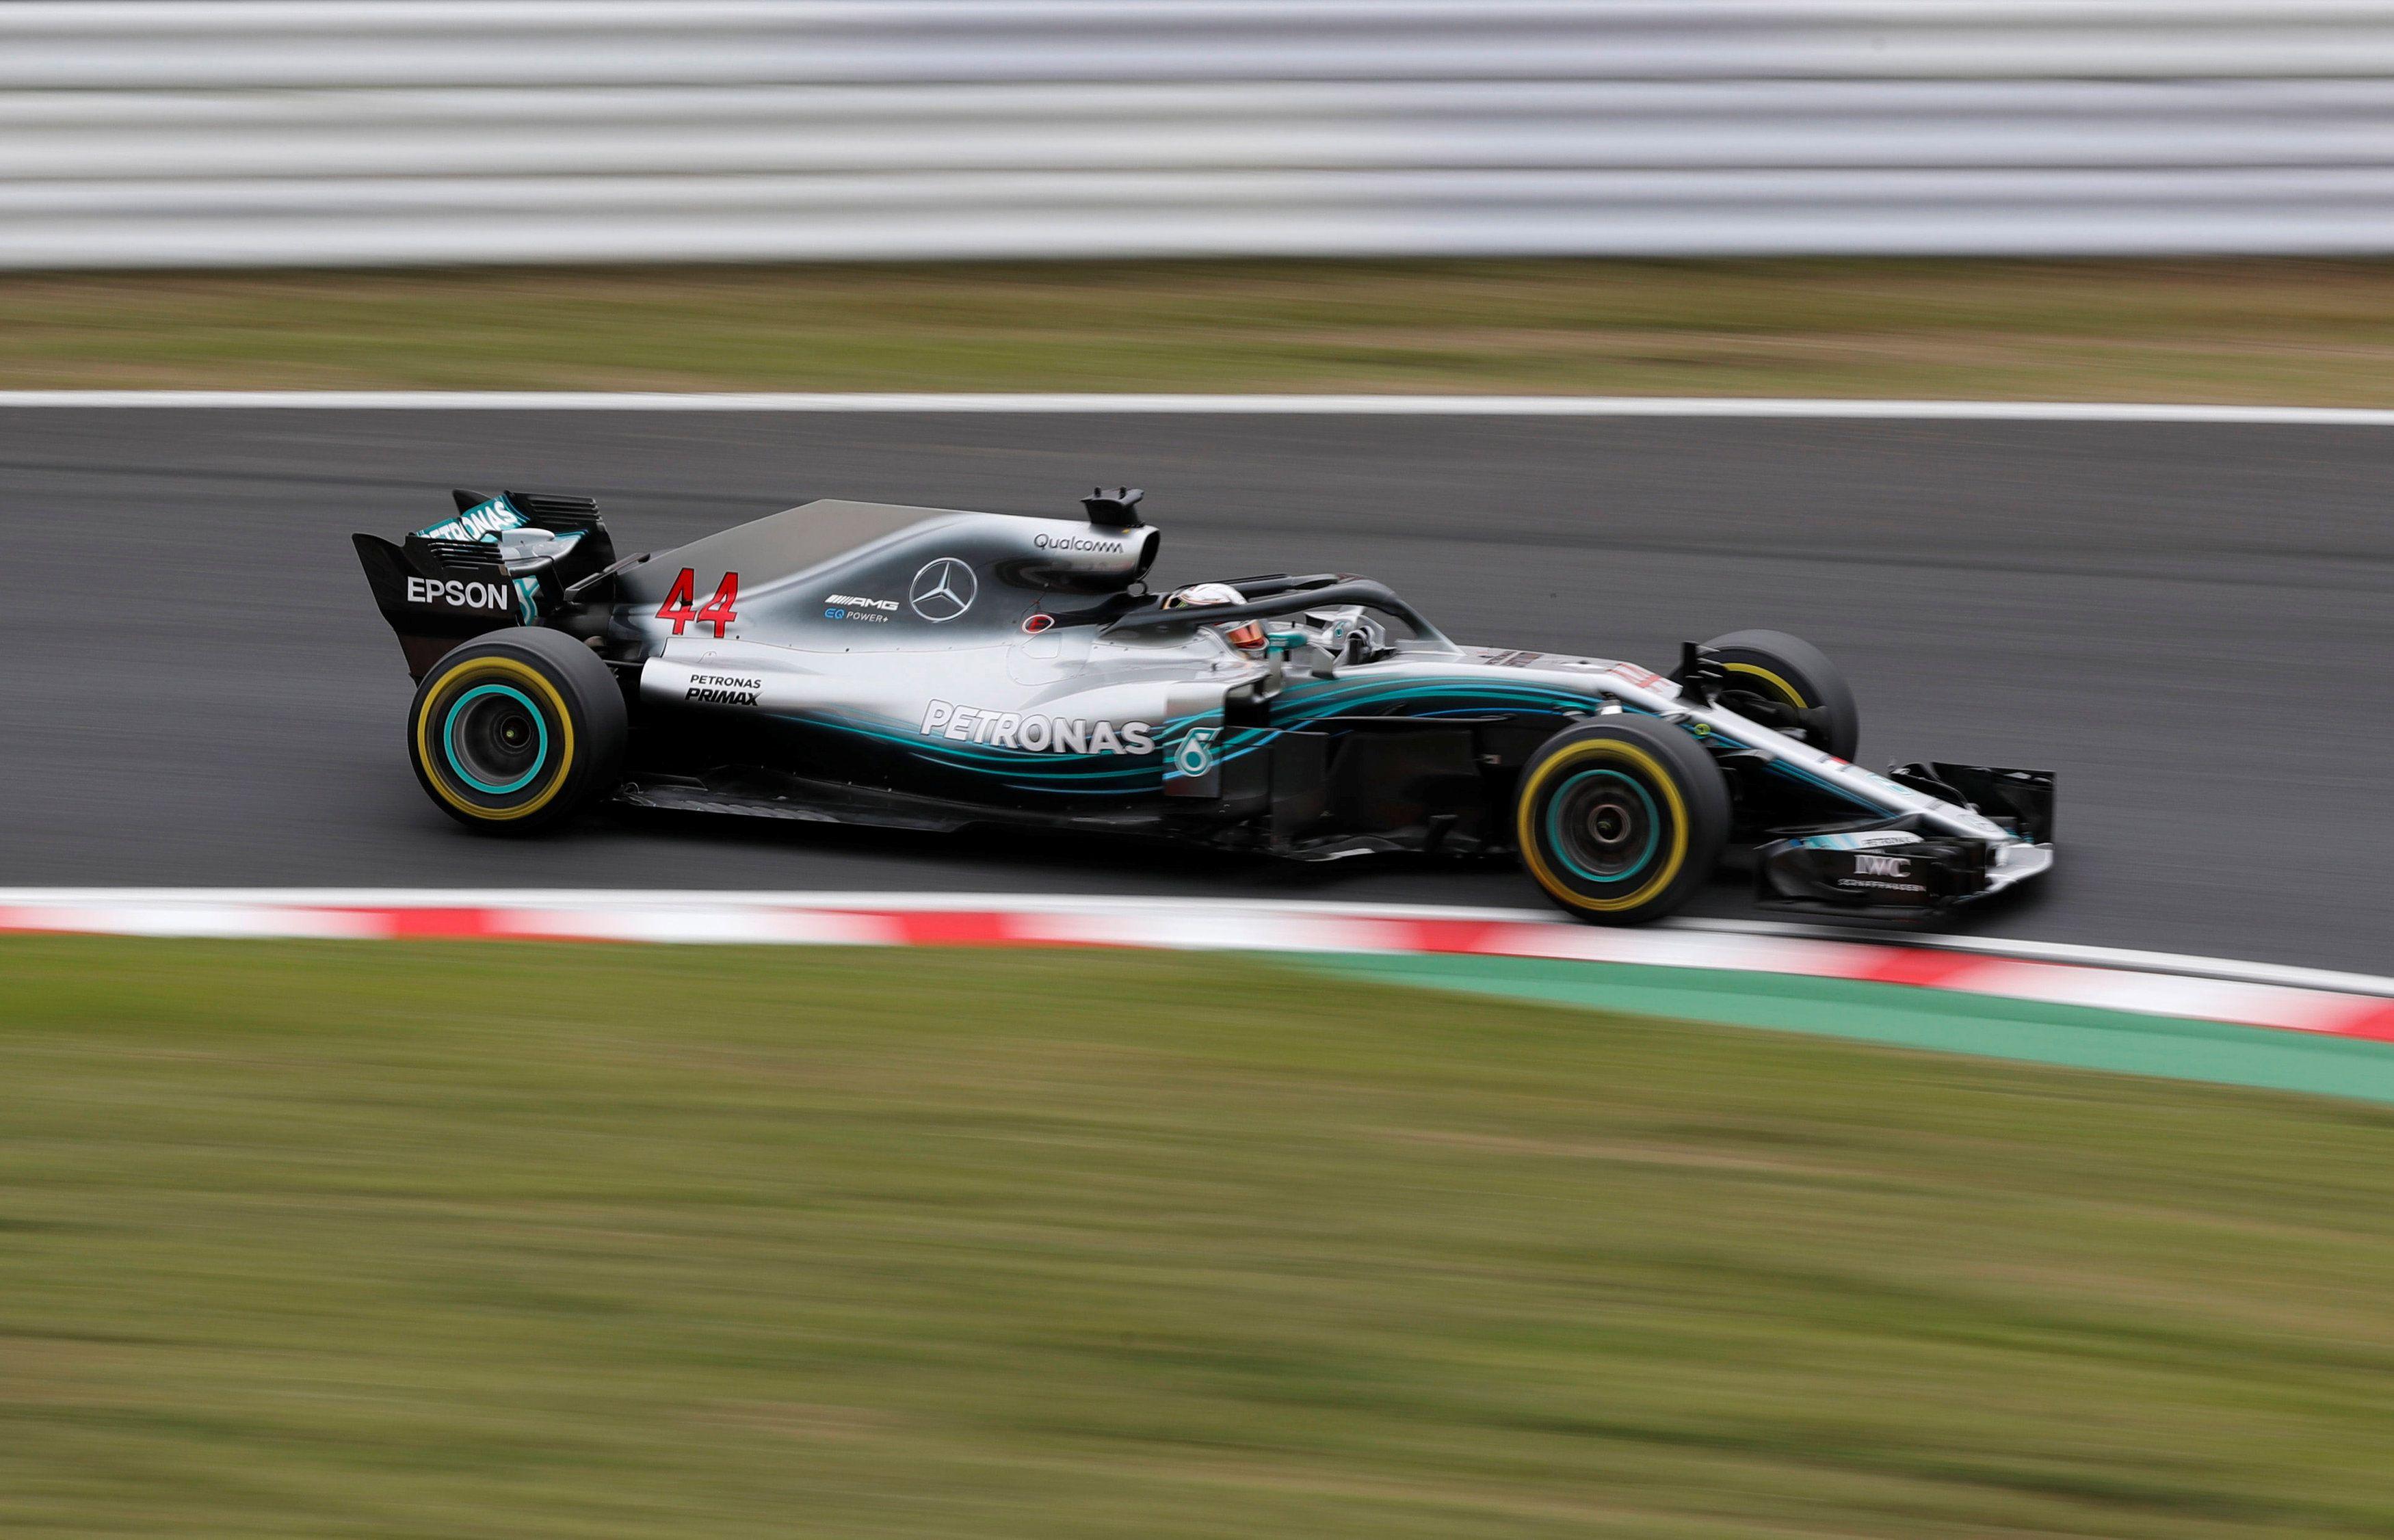 Mini Cup Car >> Japanese GP: Hamilton maintains Mercedes' dominance in FP2 at Suzuka